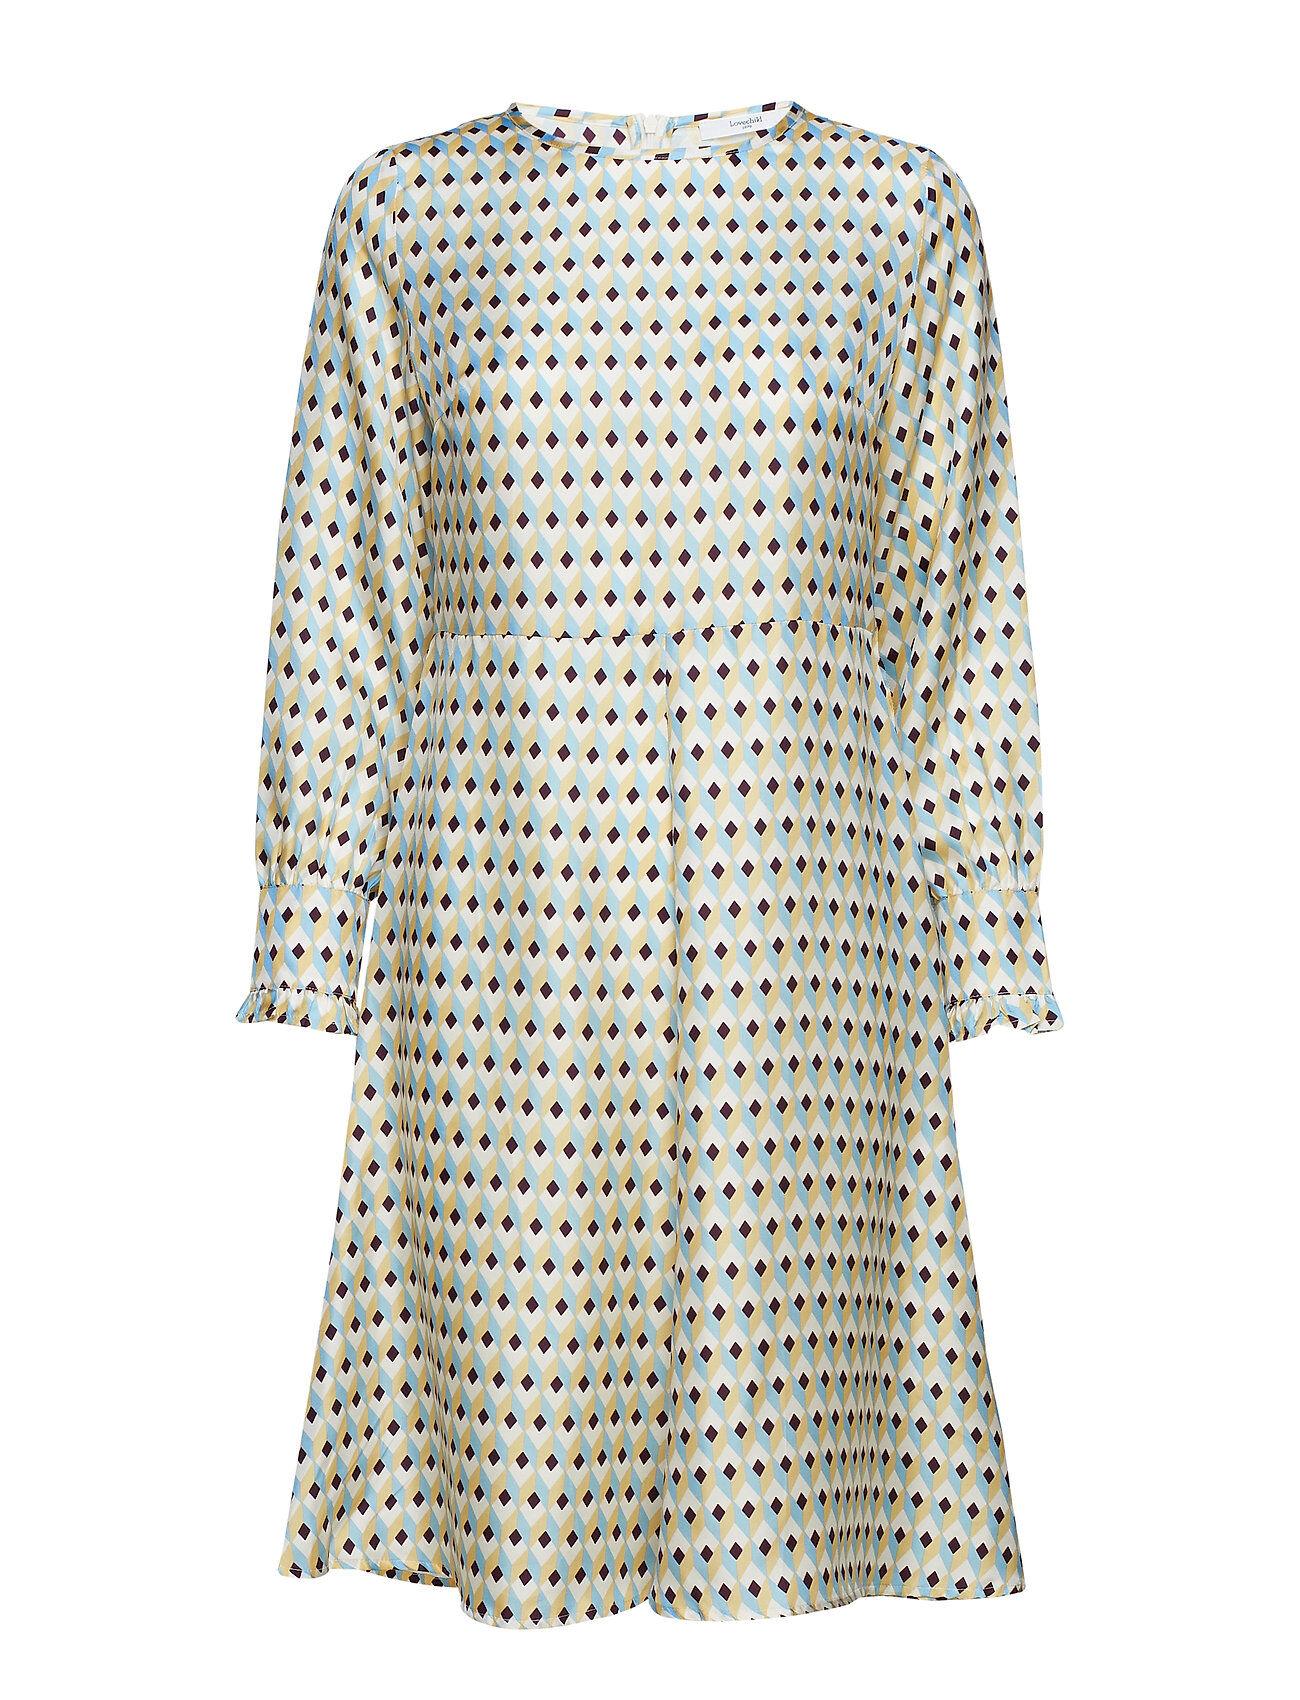 Lovechild 1979 Gaia Dress